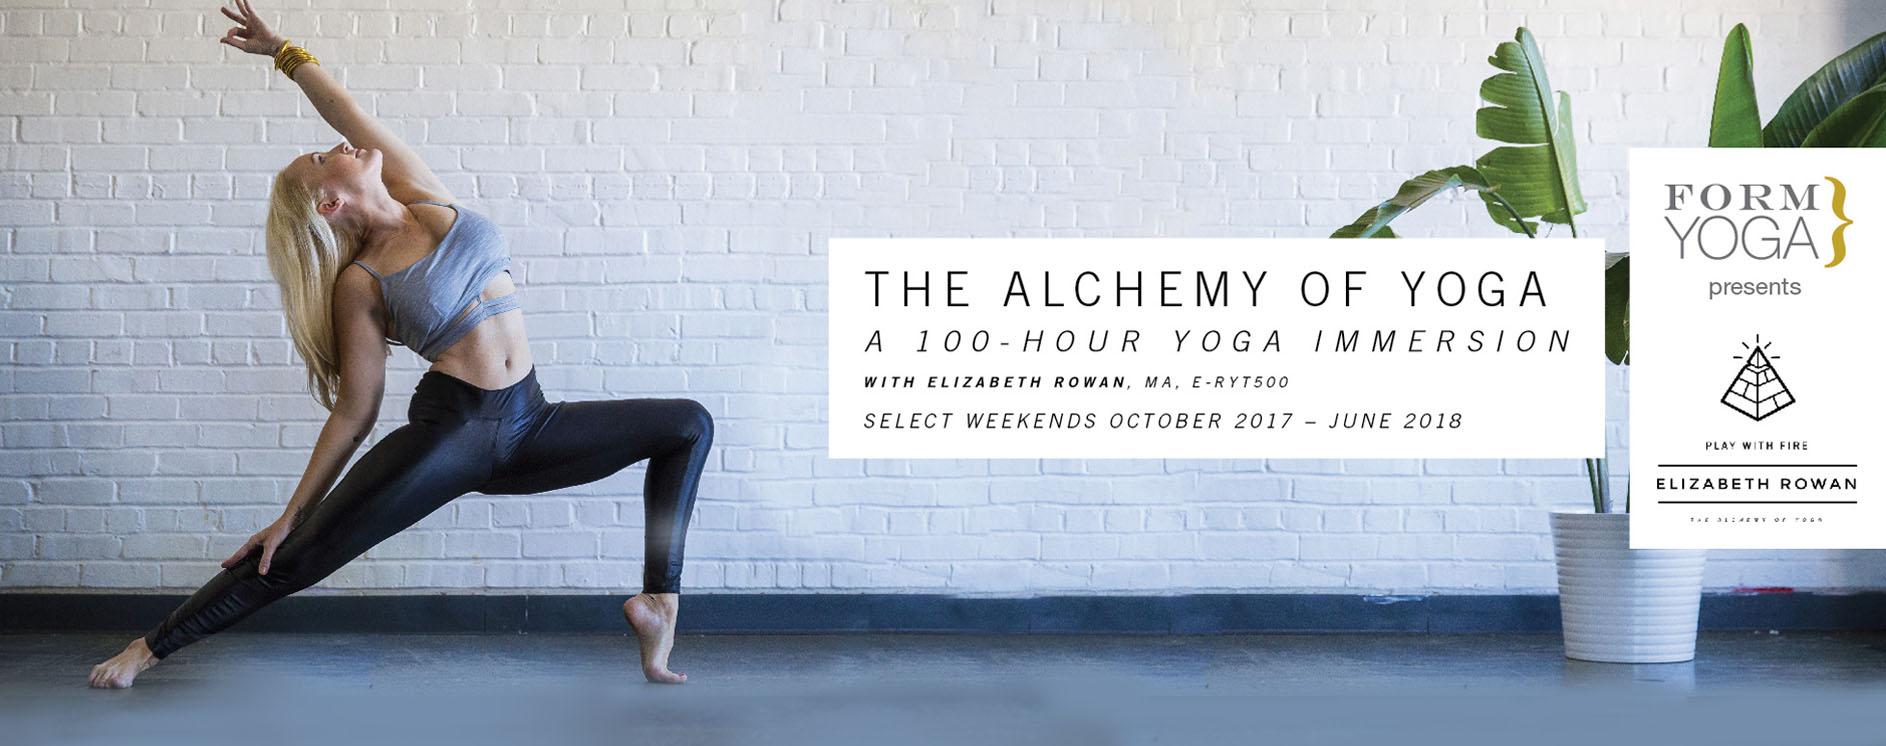 TheAlchemy-of-Yoga